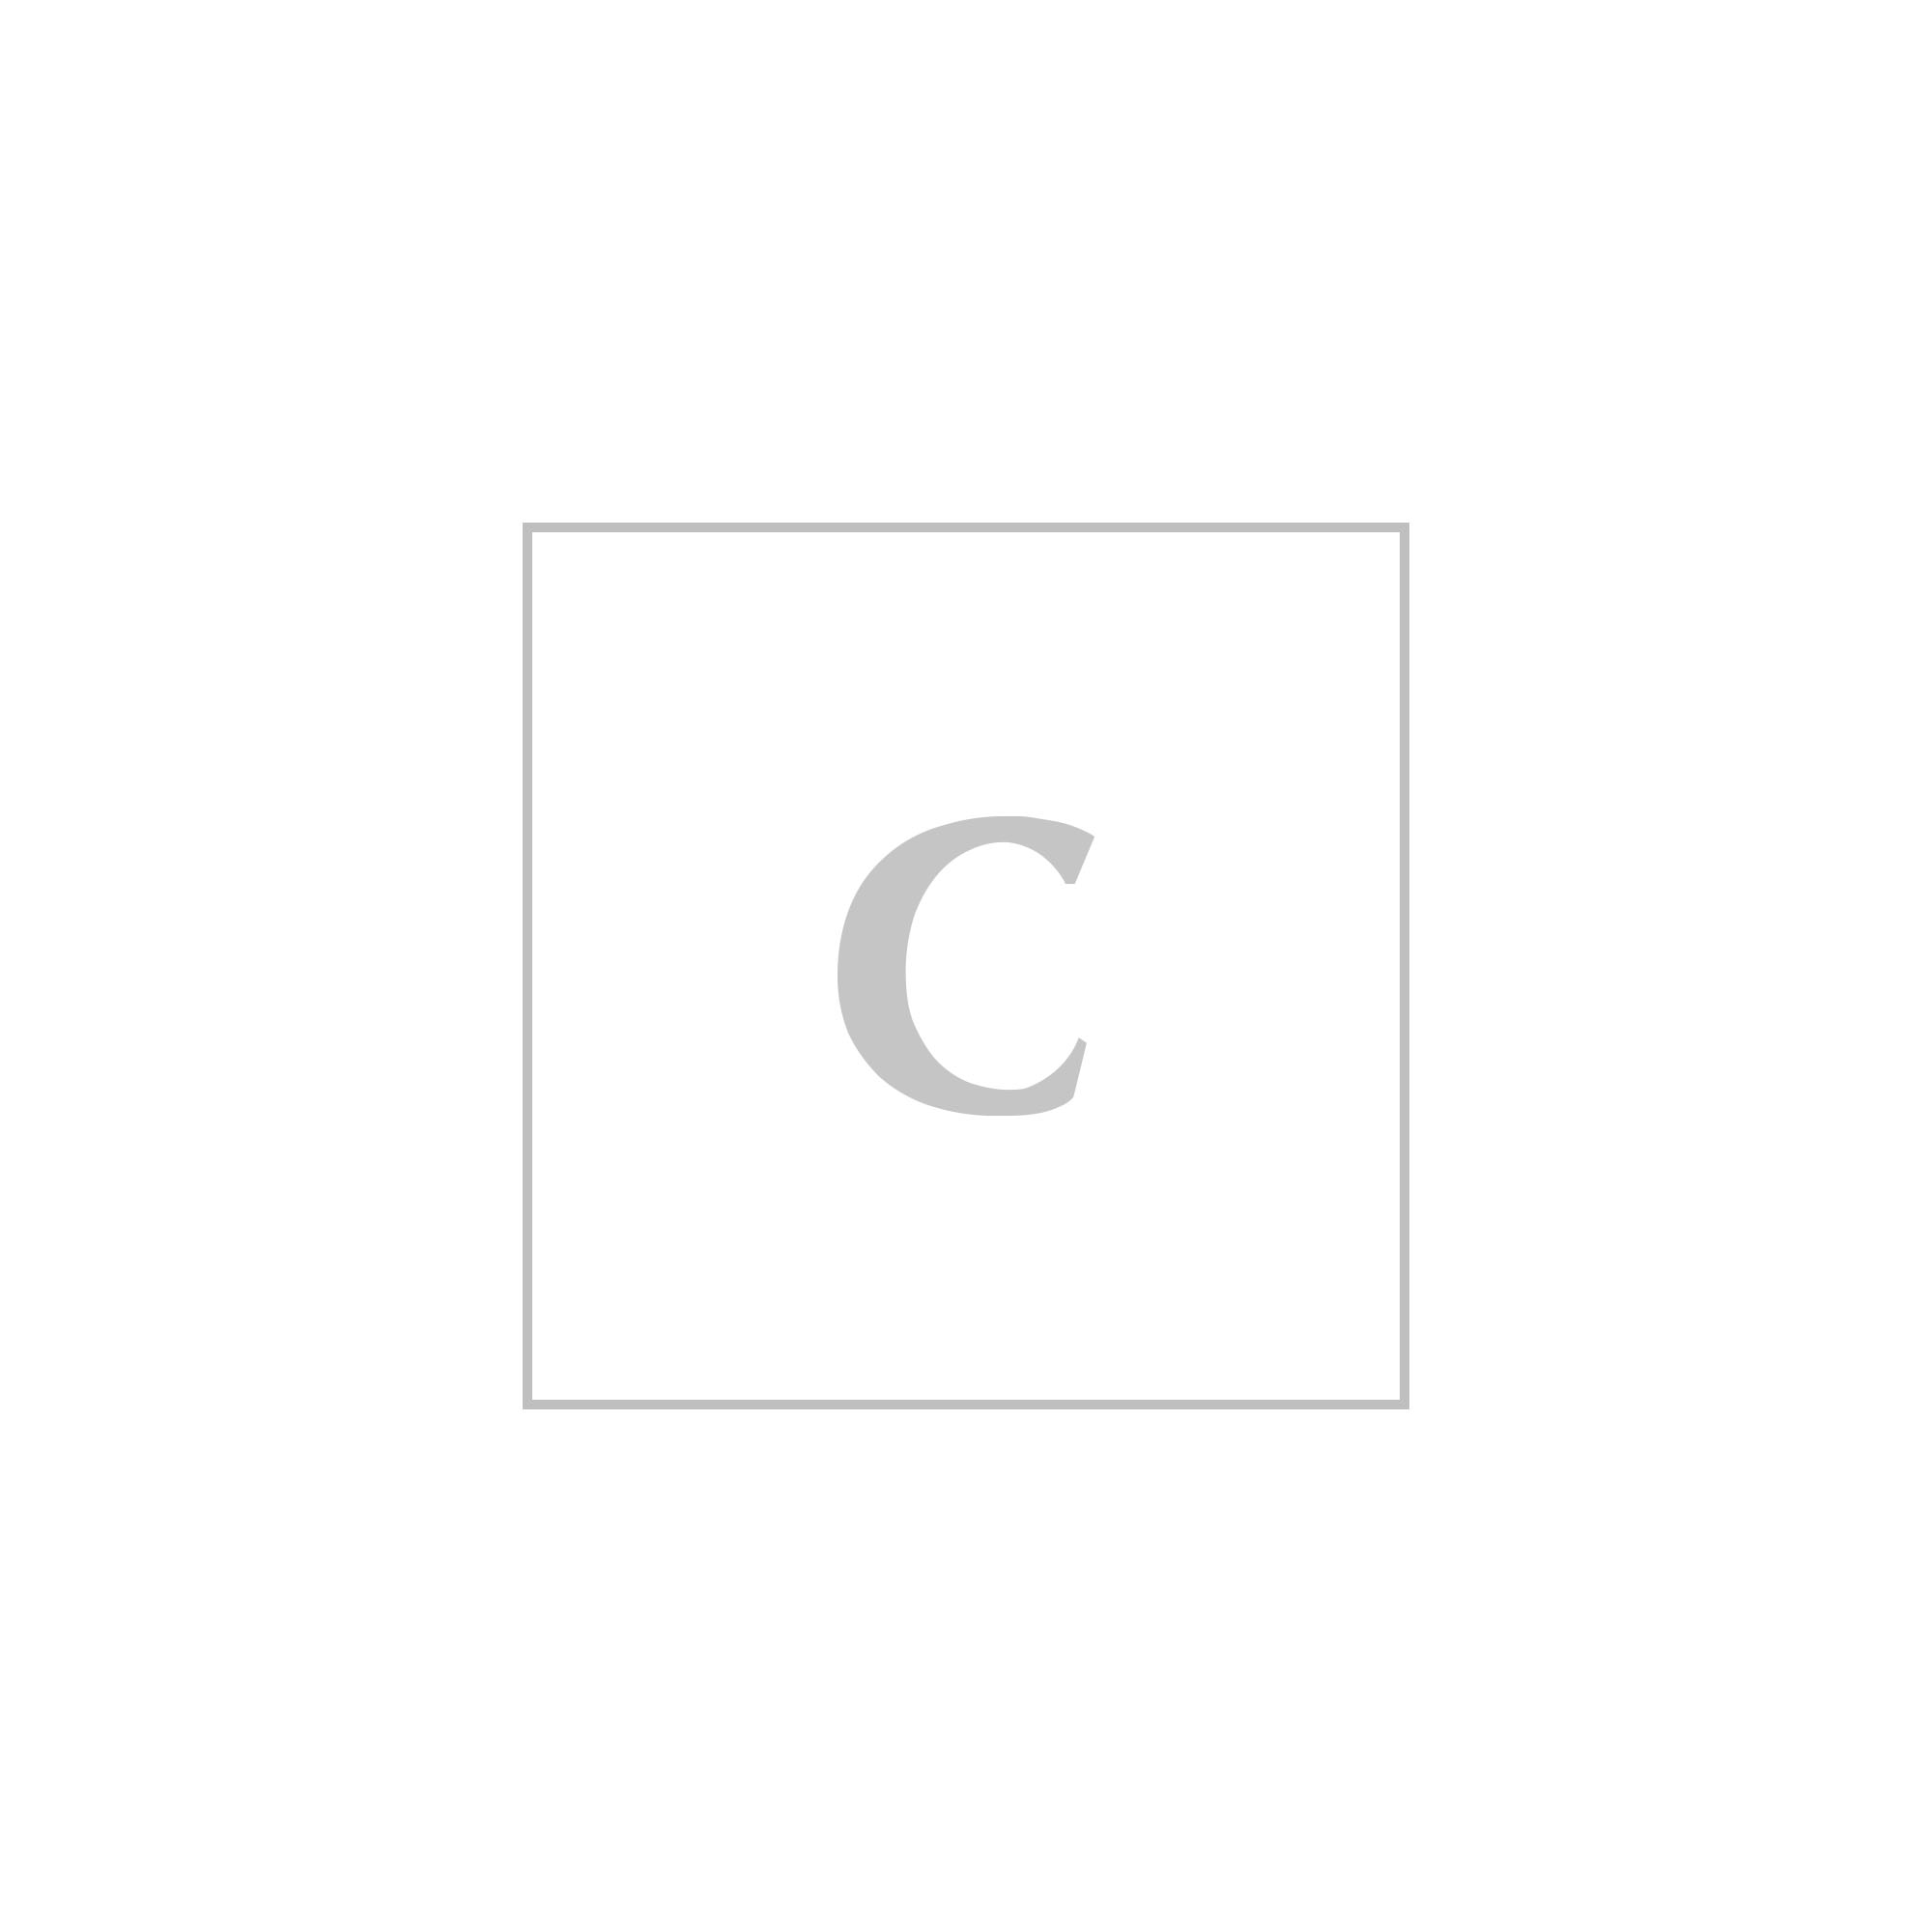 Christian Dior borsa lady dior croisiere tricolor cannage